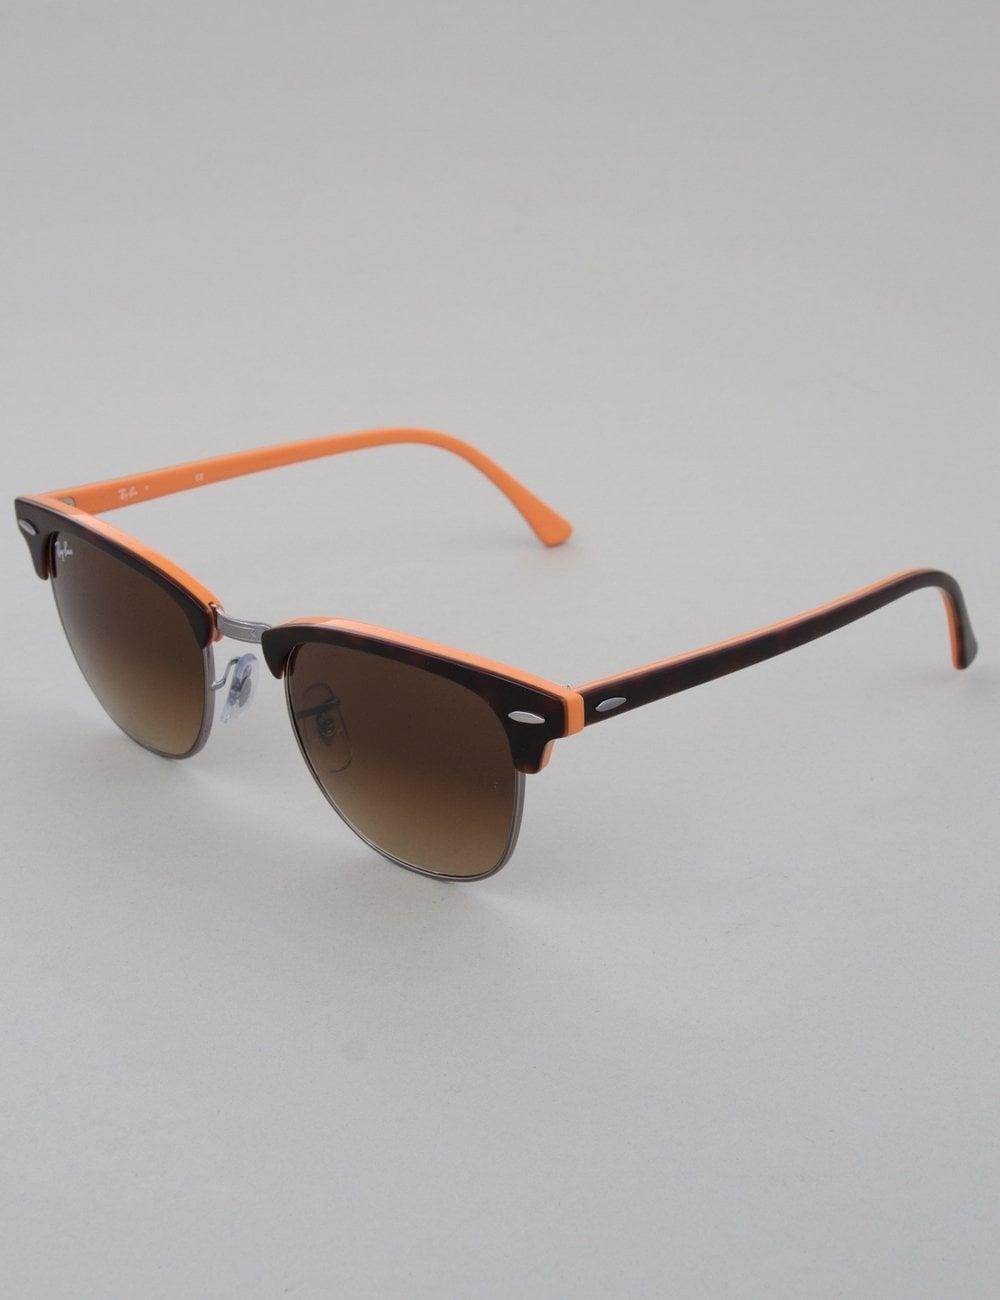 42bae1aa6f Ray-Ban Clubmaster Sunglasses - Top Dark Havana Orange    Brown Gradient